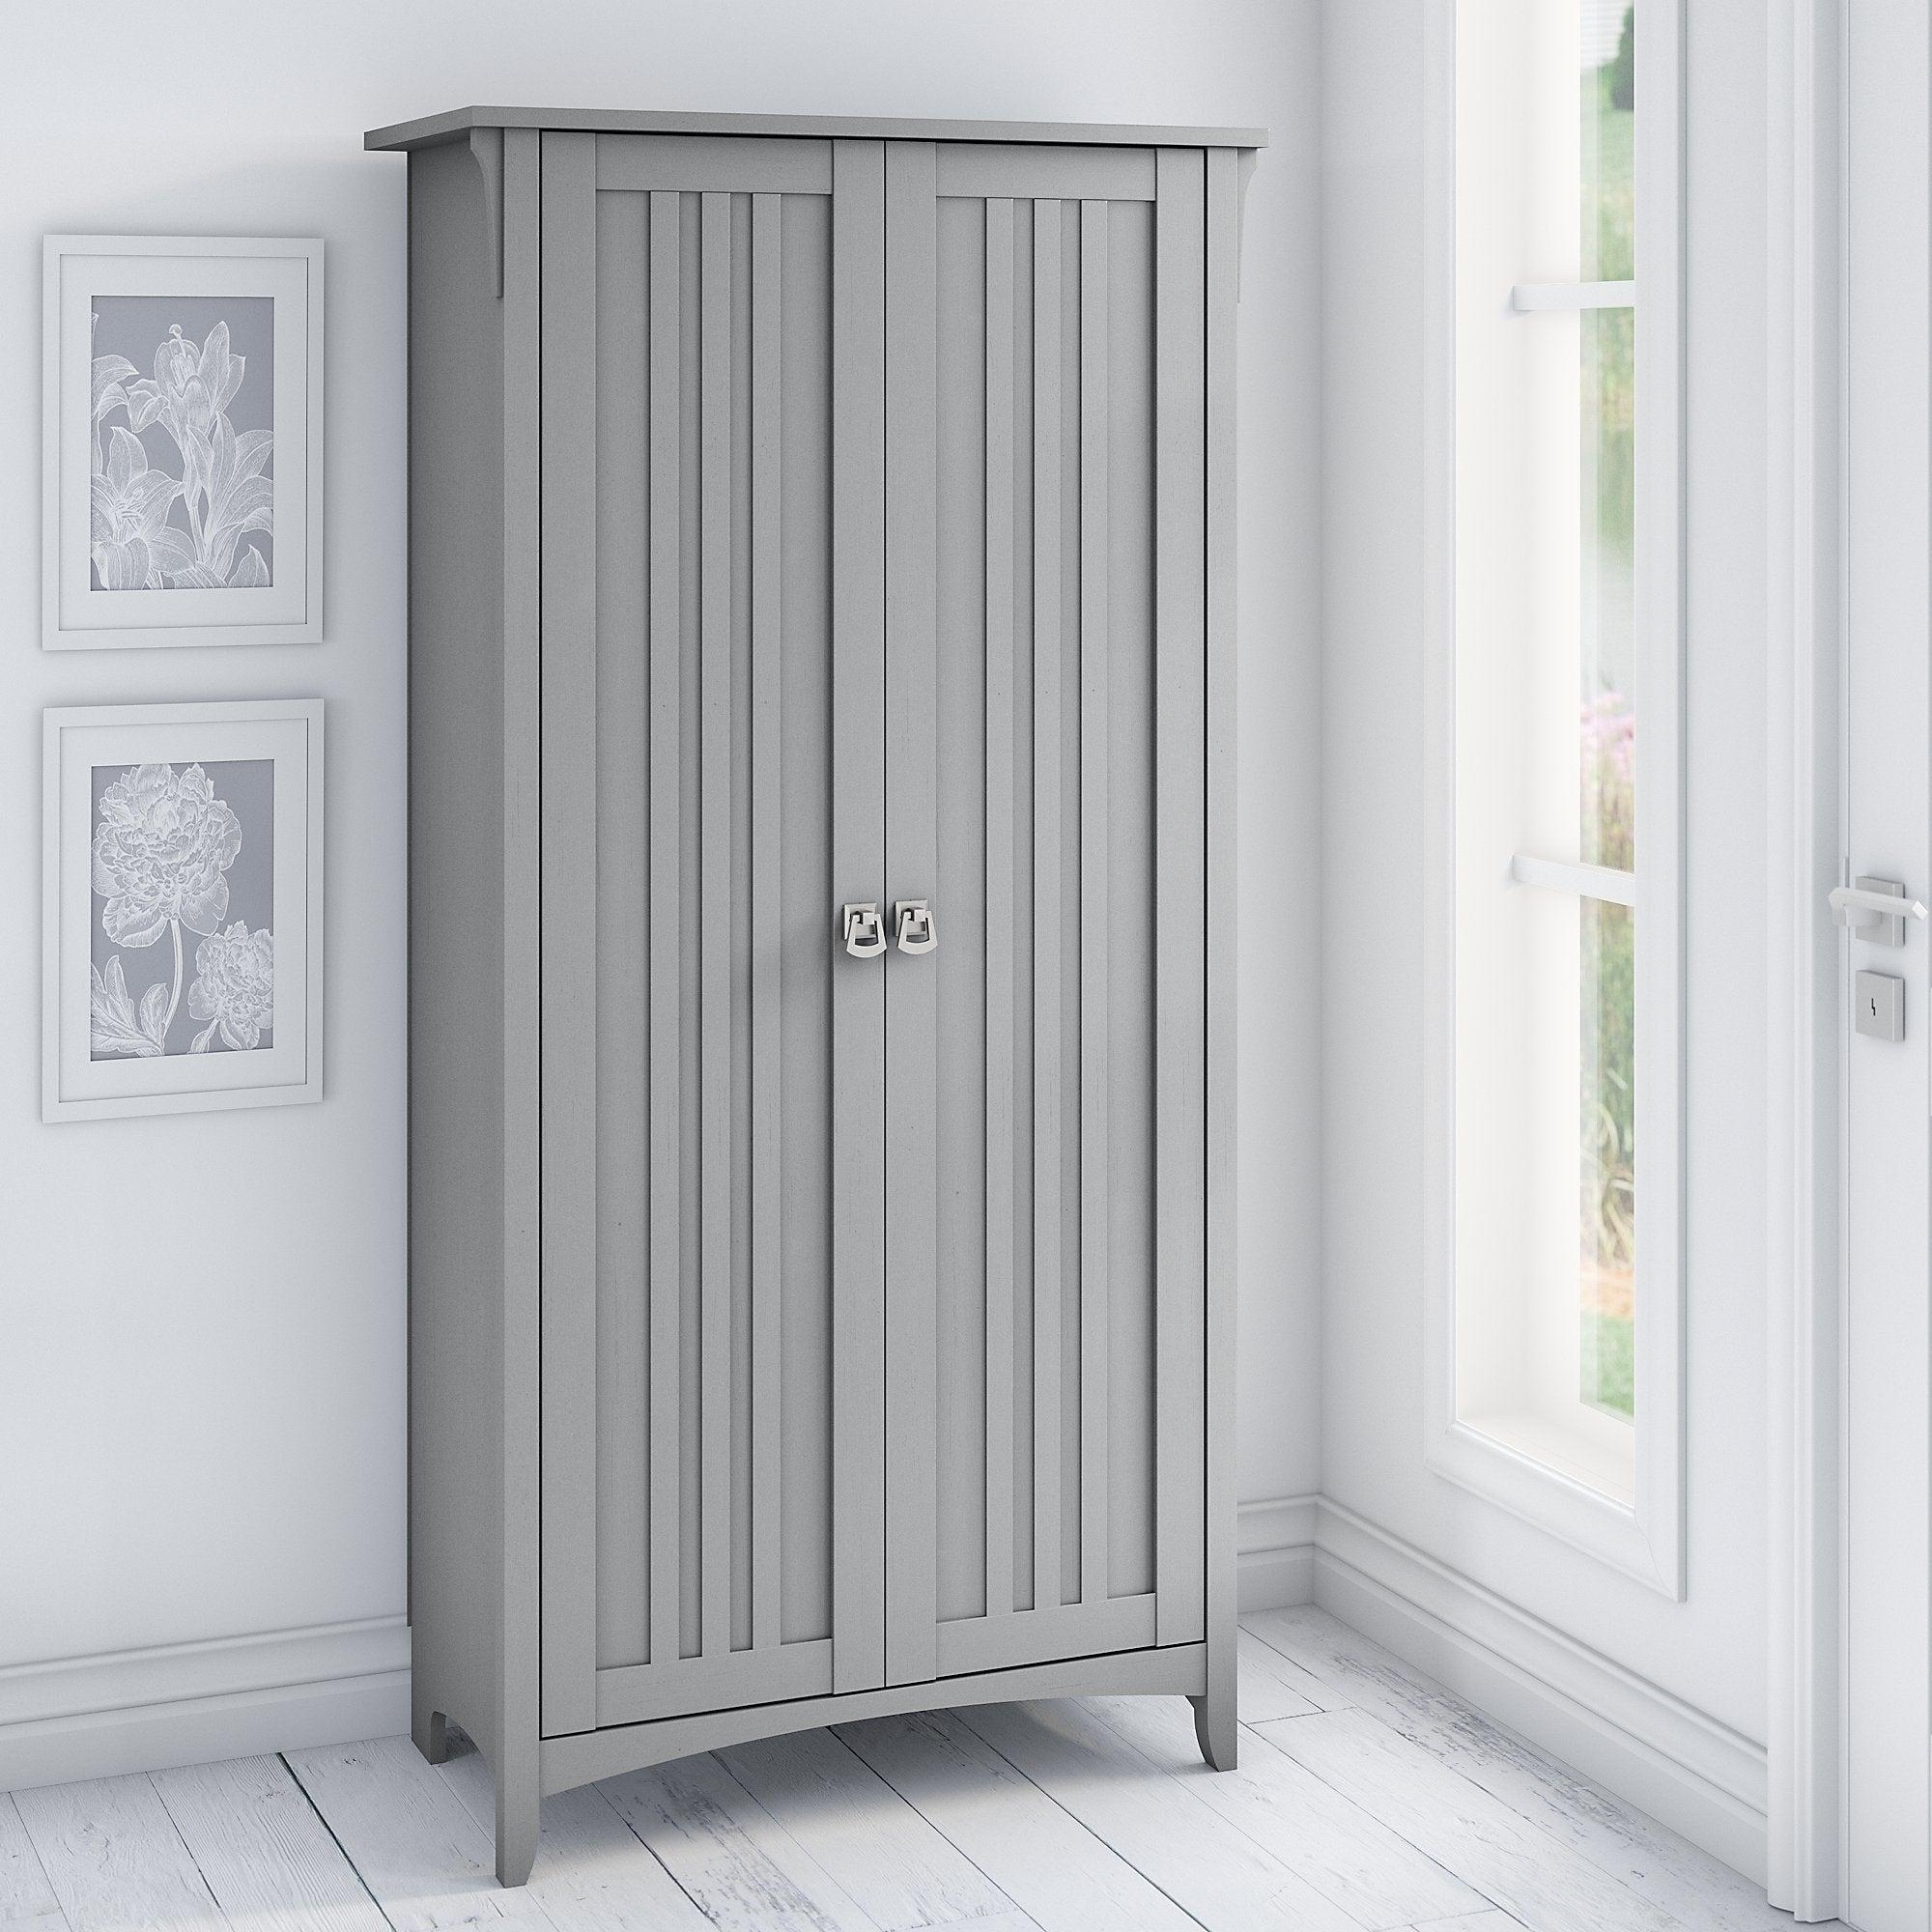 Bush Furniture Salinas Tall Storage Cabinet with Doors (White)